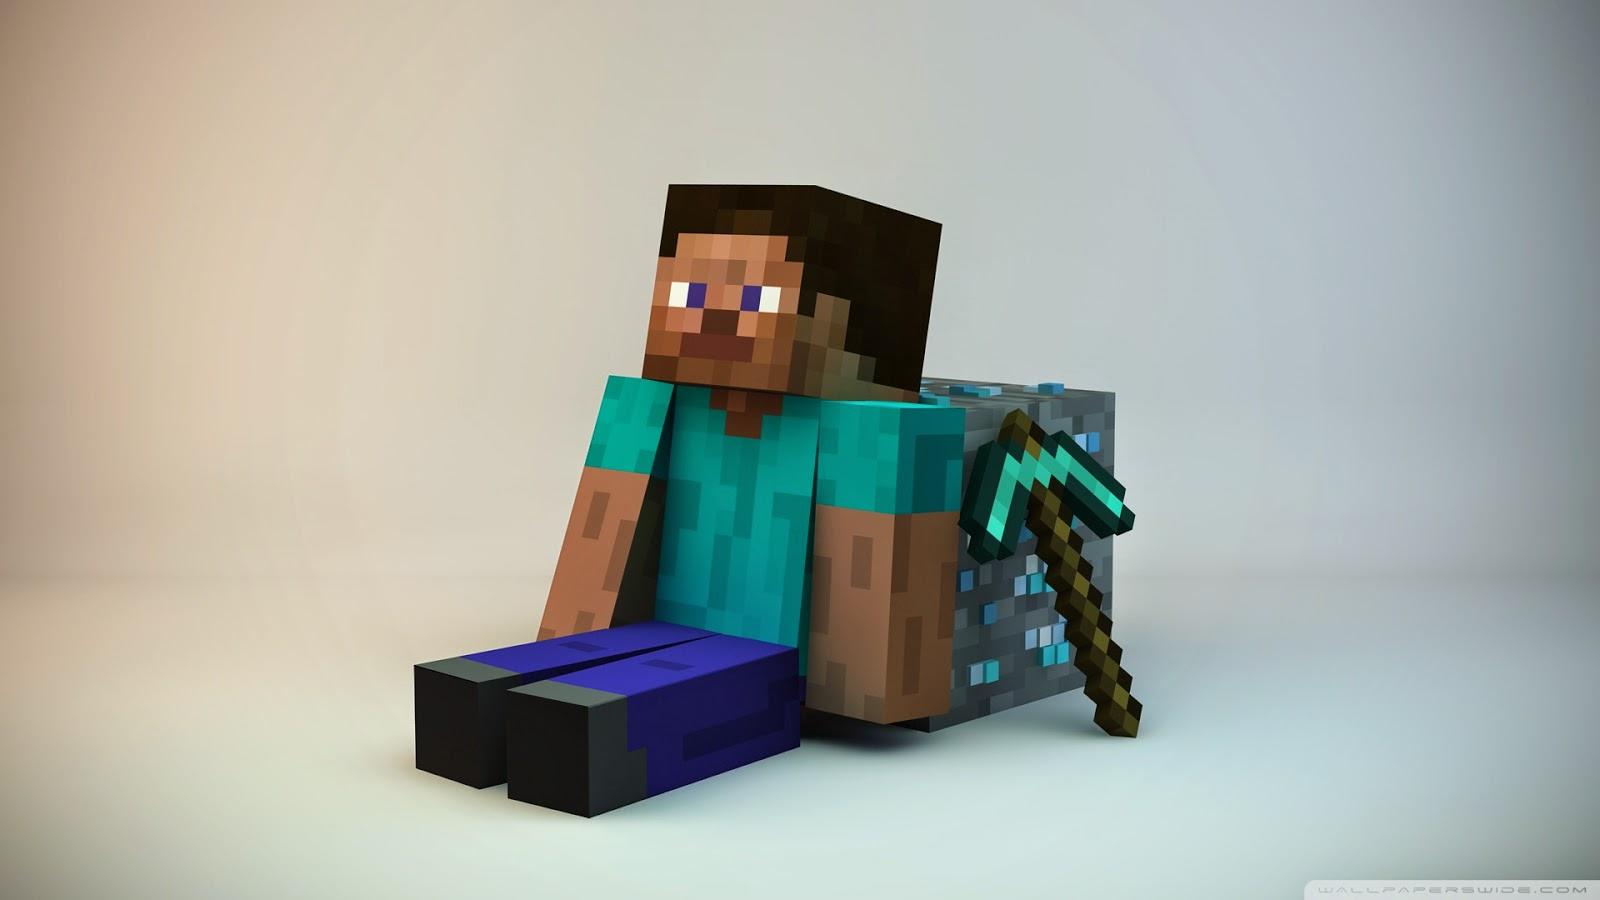 Minecraft chega ao PS4 e PSVita em agosto deste ano - PlayStation Blast